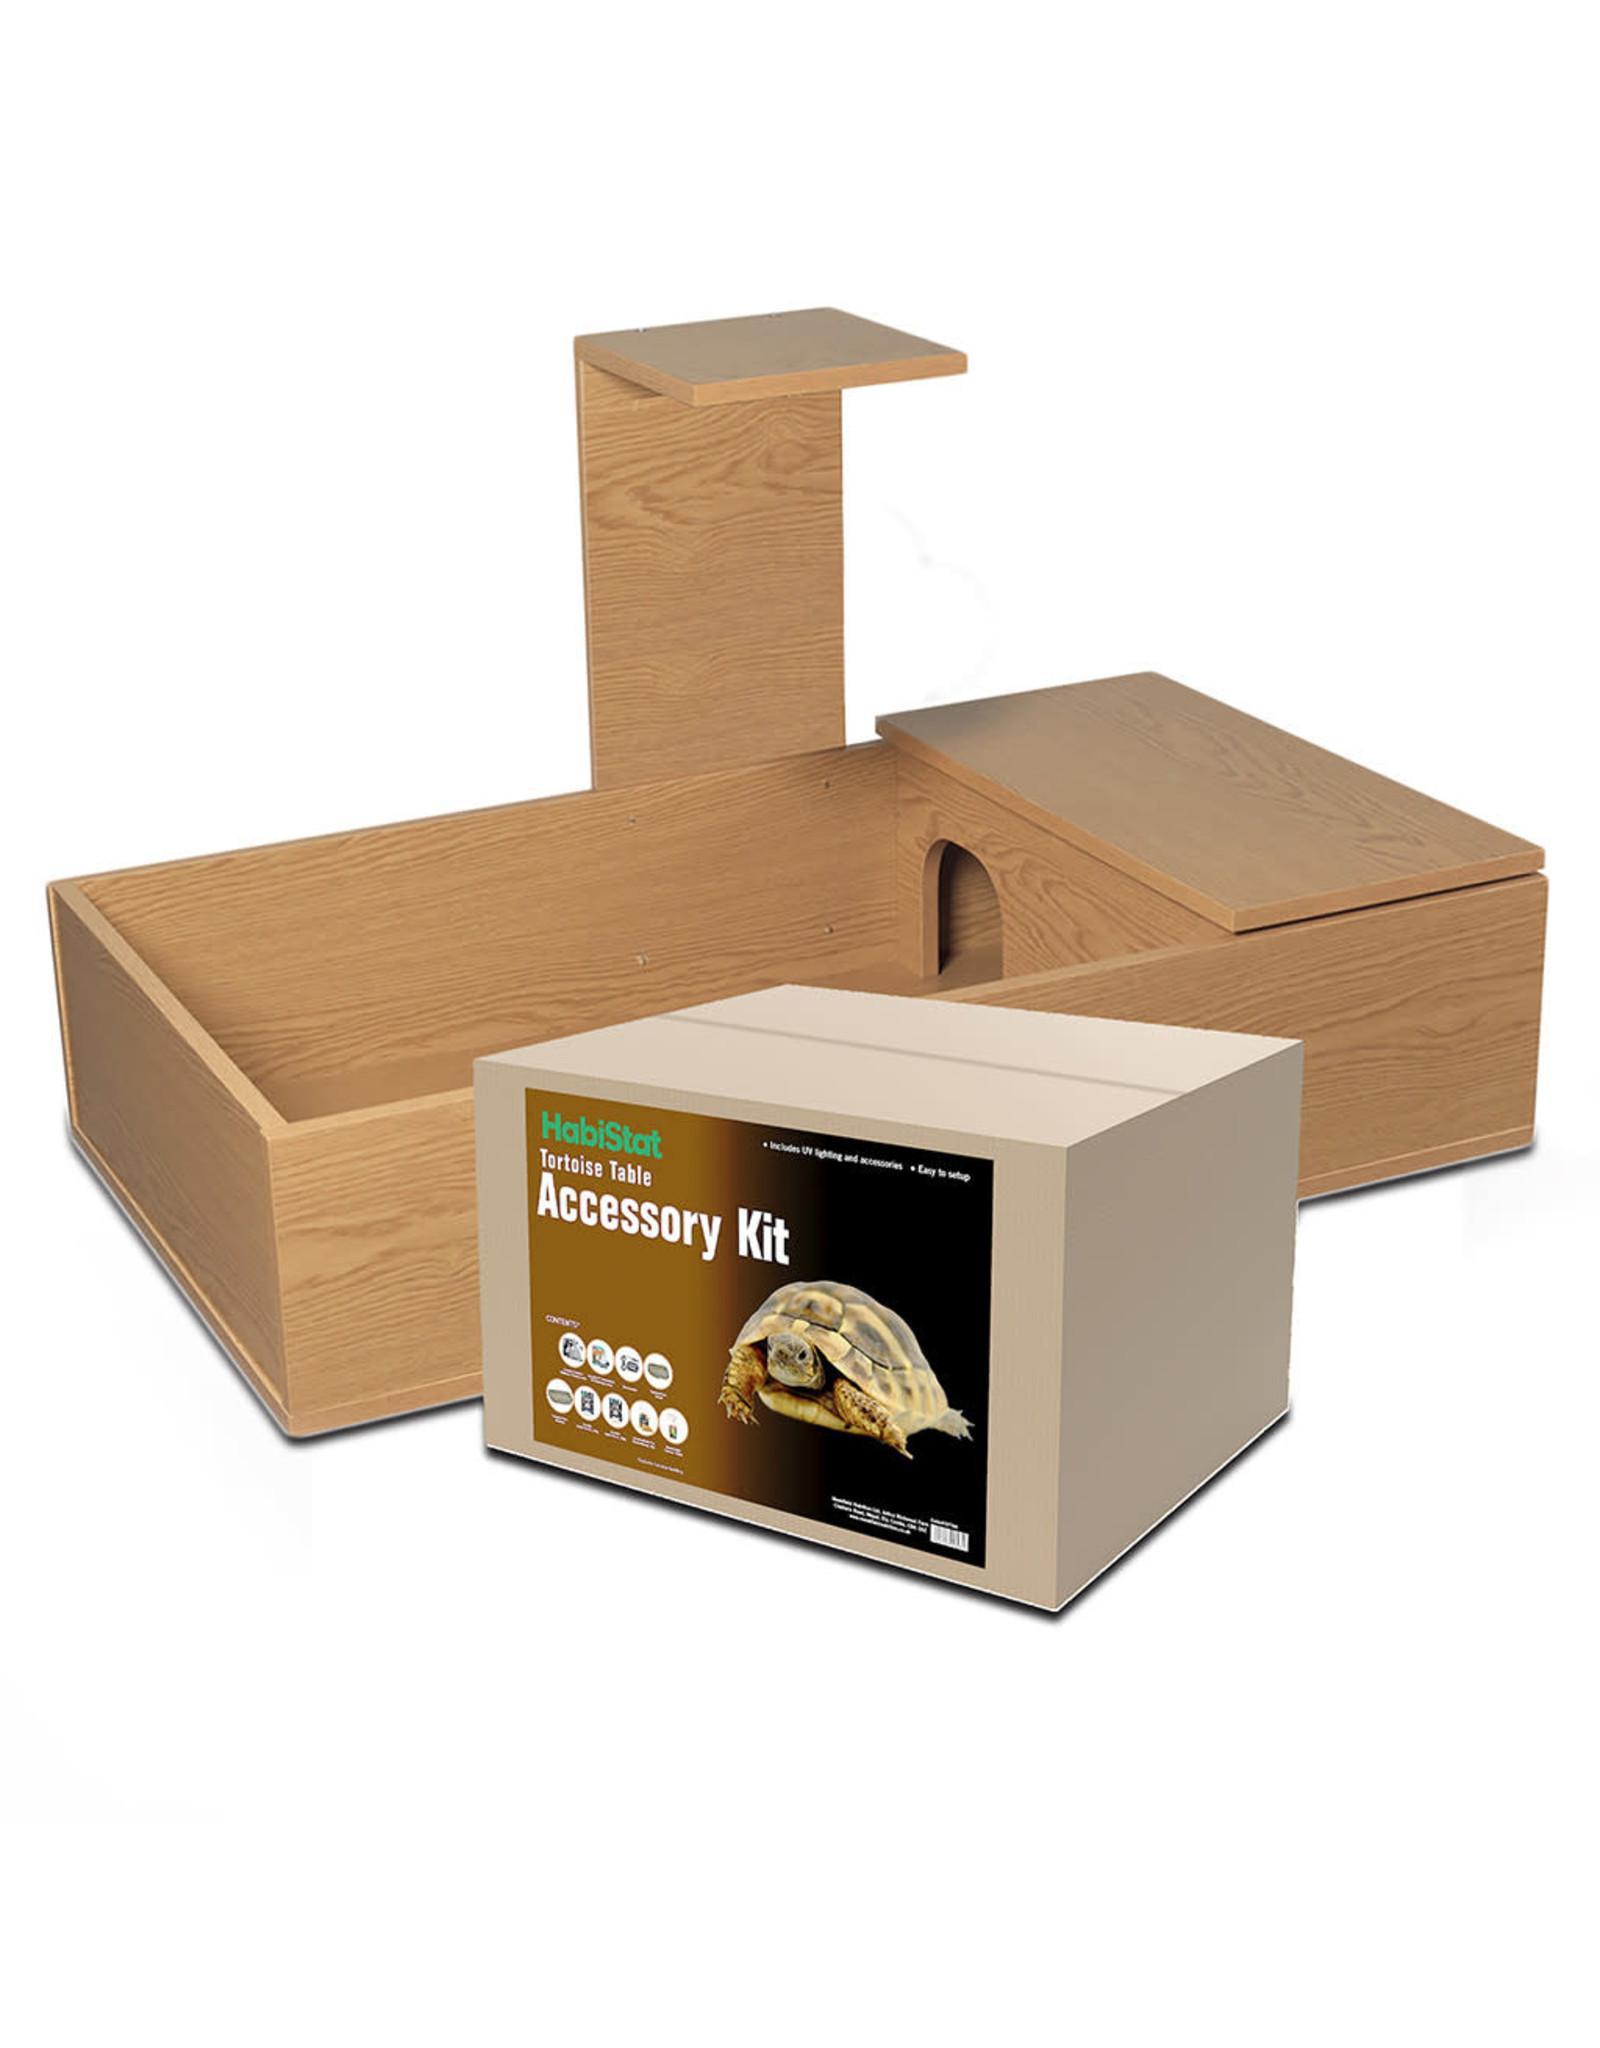 Habistat Habistat Tortoise Table Starter Kit Oak